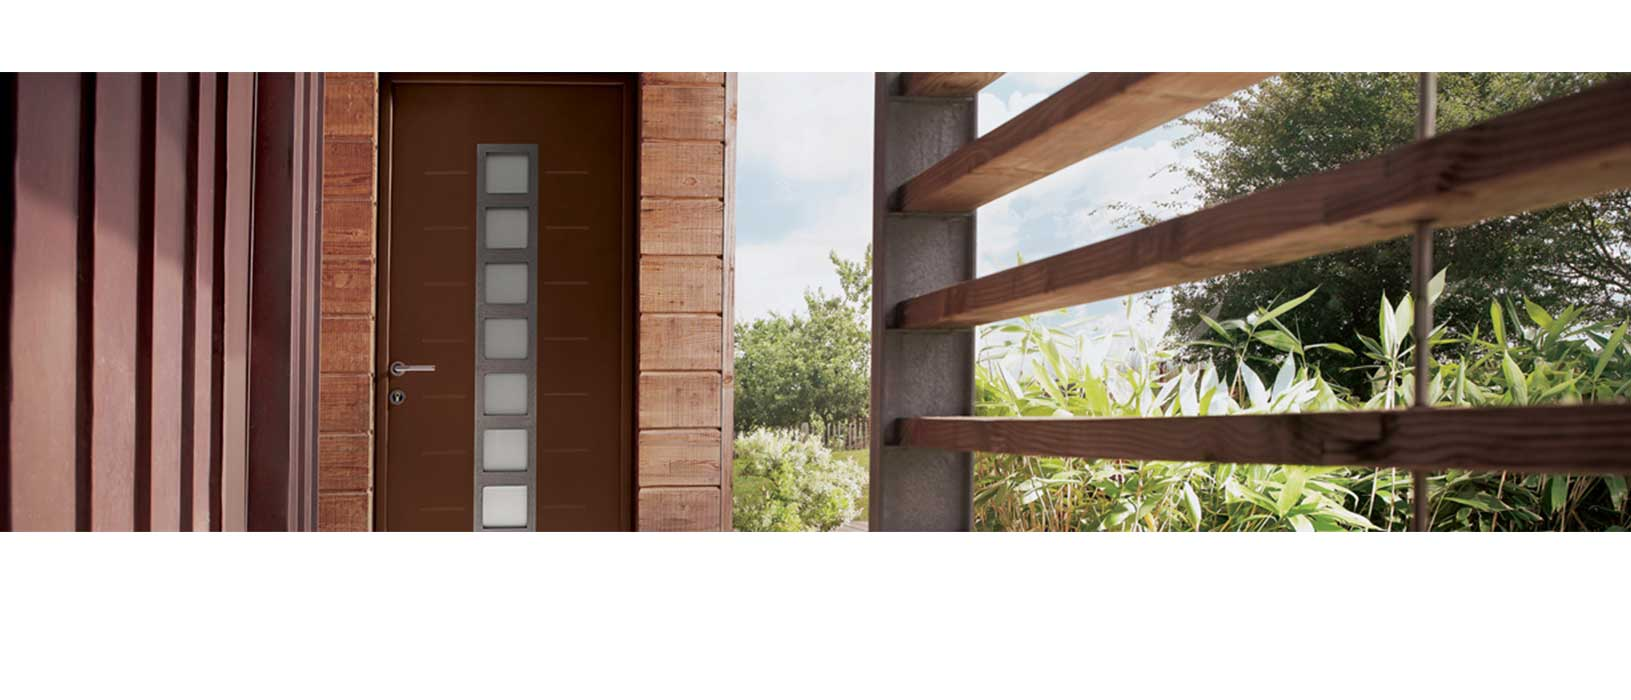 porte entree sur mesure alu pvc renforcee fermetures. Black Bedroom Furniture Sets. Home Design Ideas